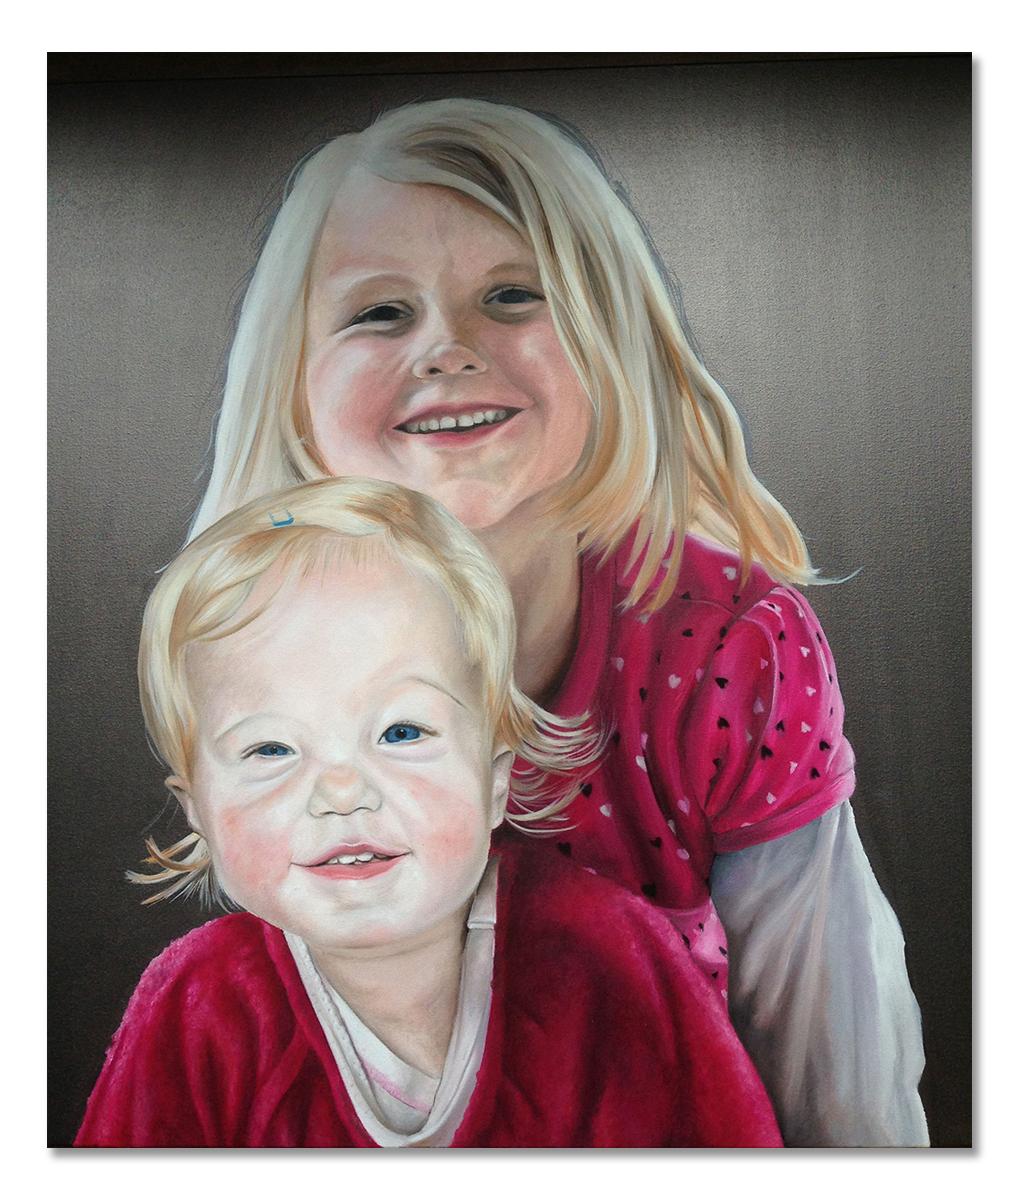 portret8-karin-neijenhuis-w